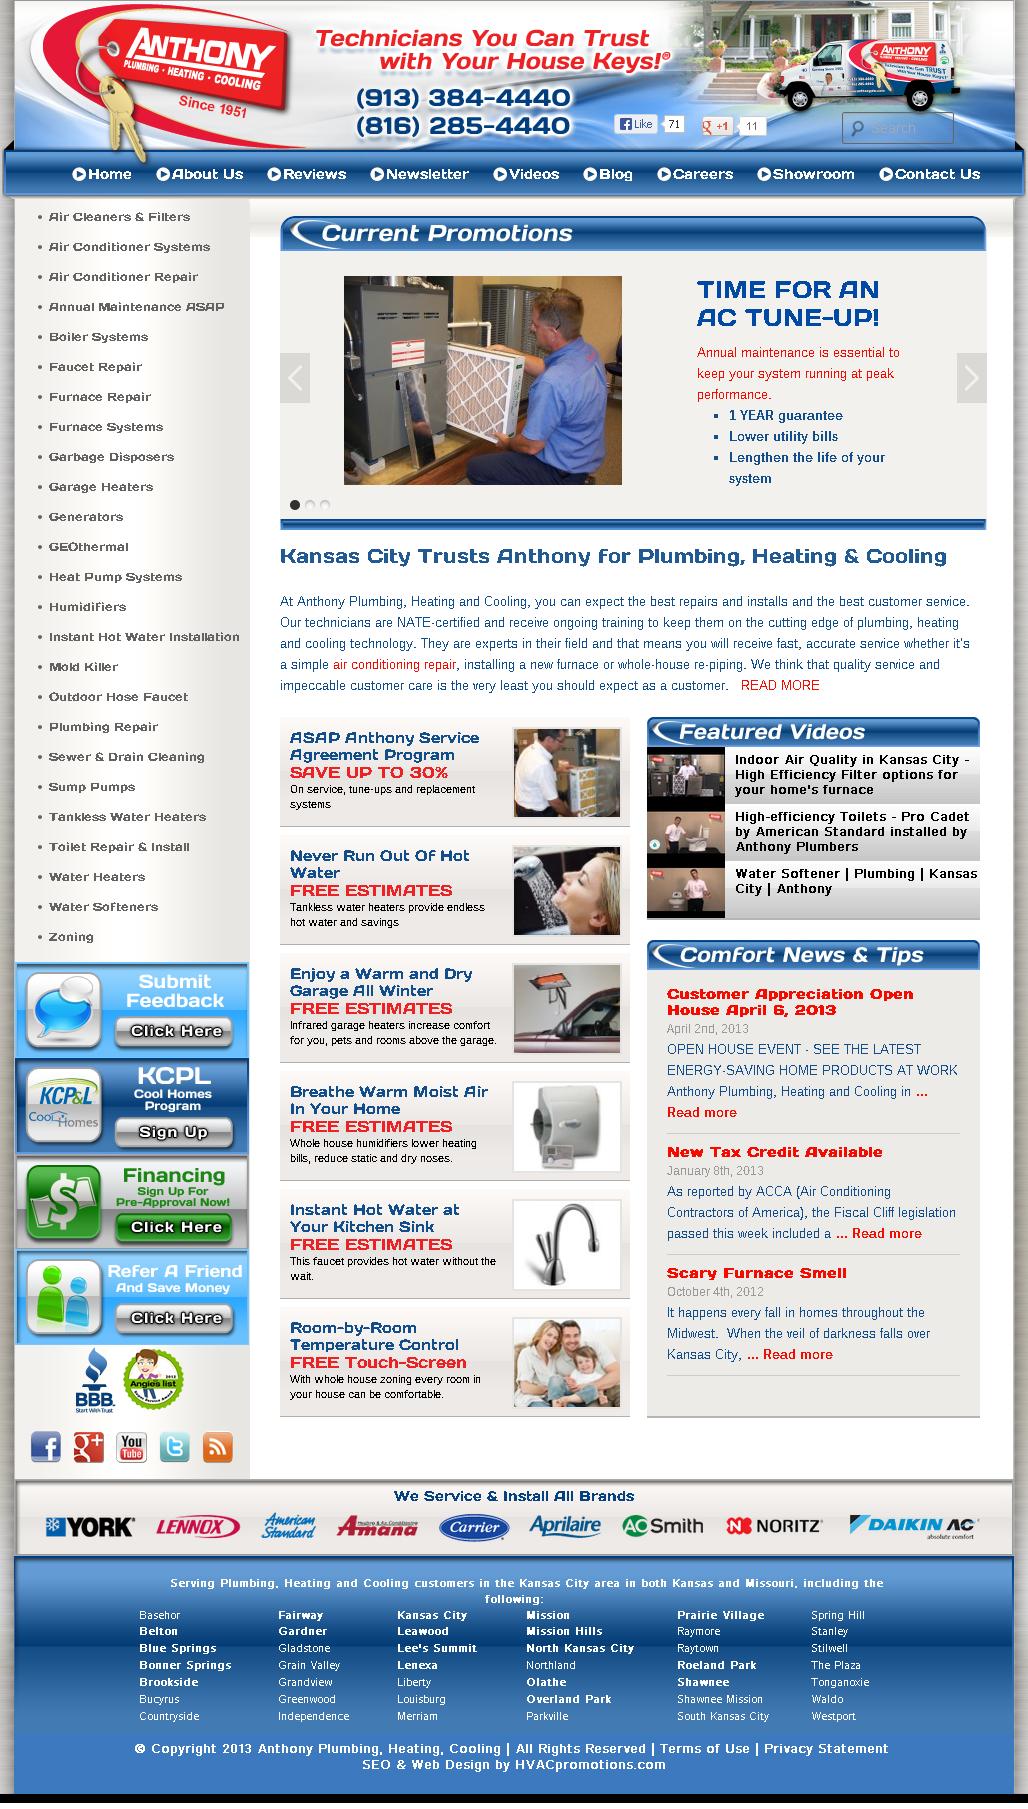 Missouri Hvac Website Design And Lead Generation Services With Lurecreative Com Lurecreative Hvac Web Website Design Air Conditioning Technician Web Design